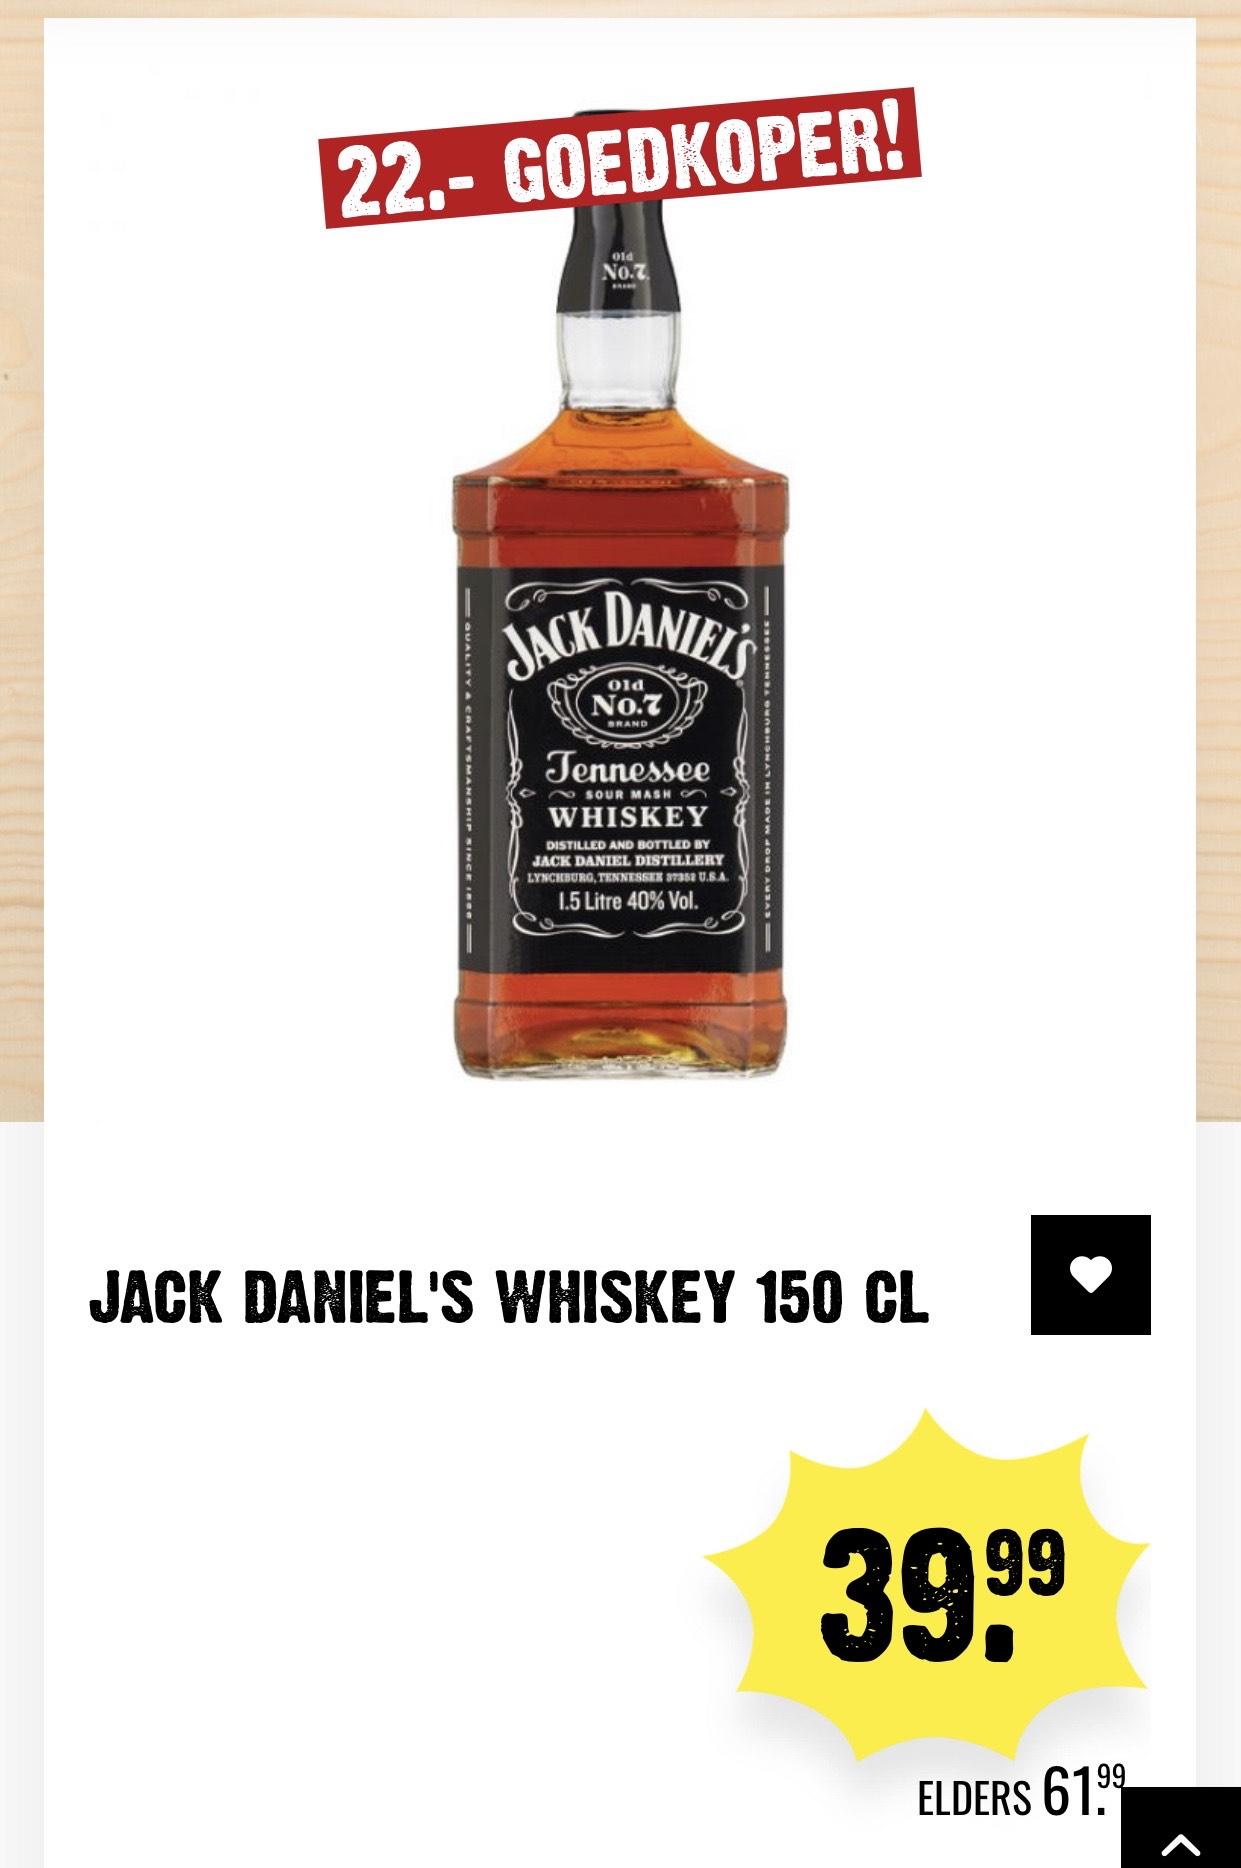 Jack Daniels Whiskey 150 CL @Dirk lll